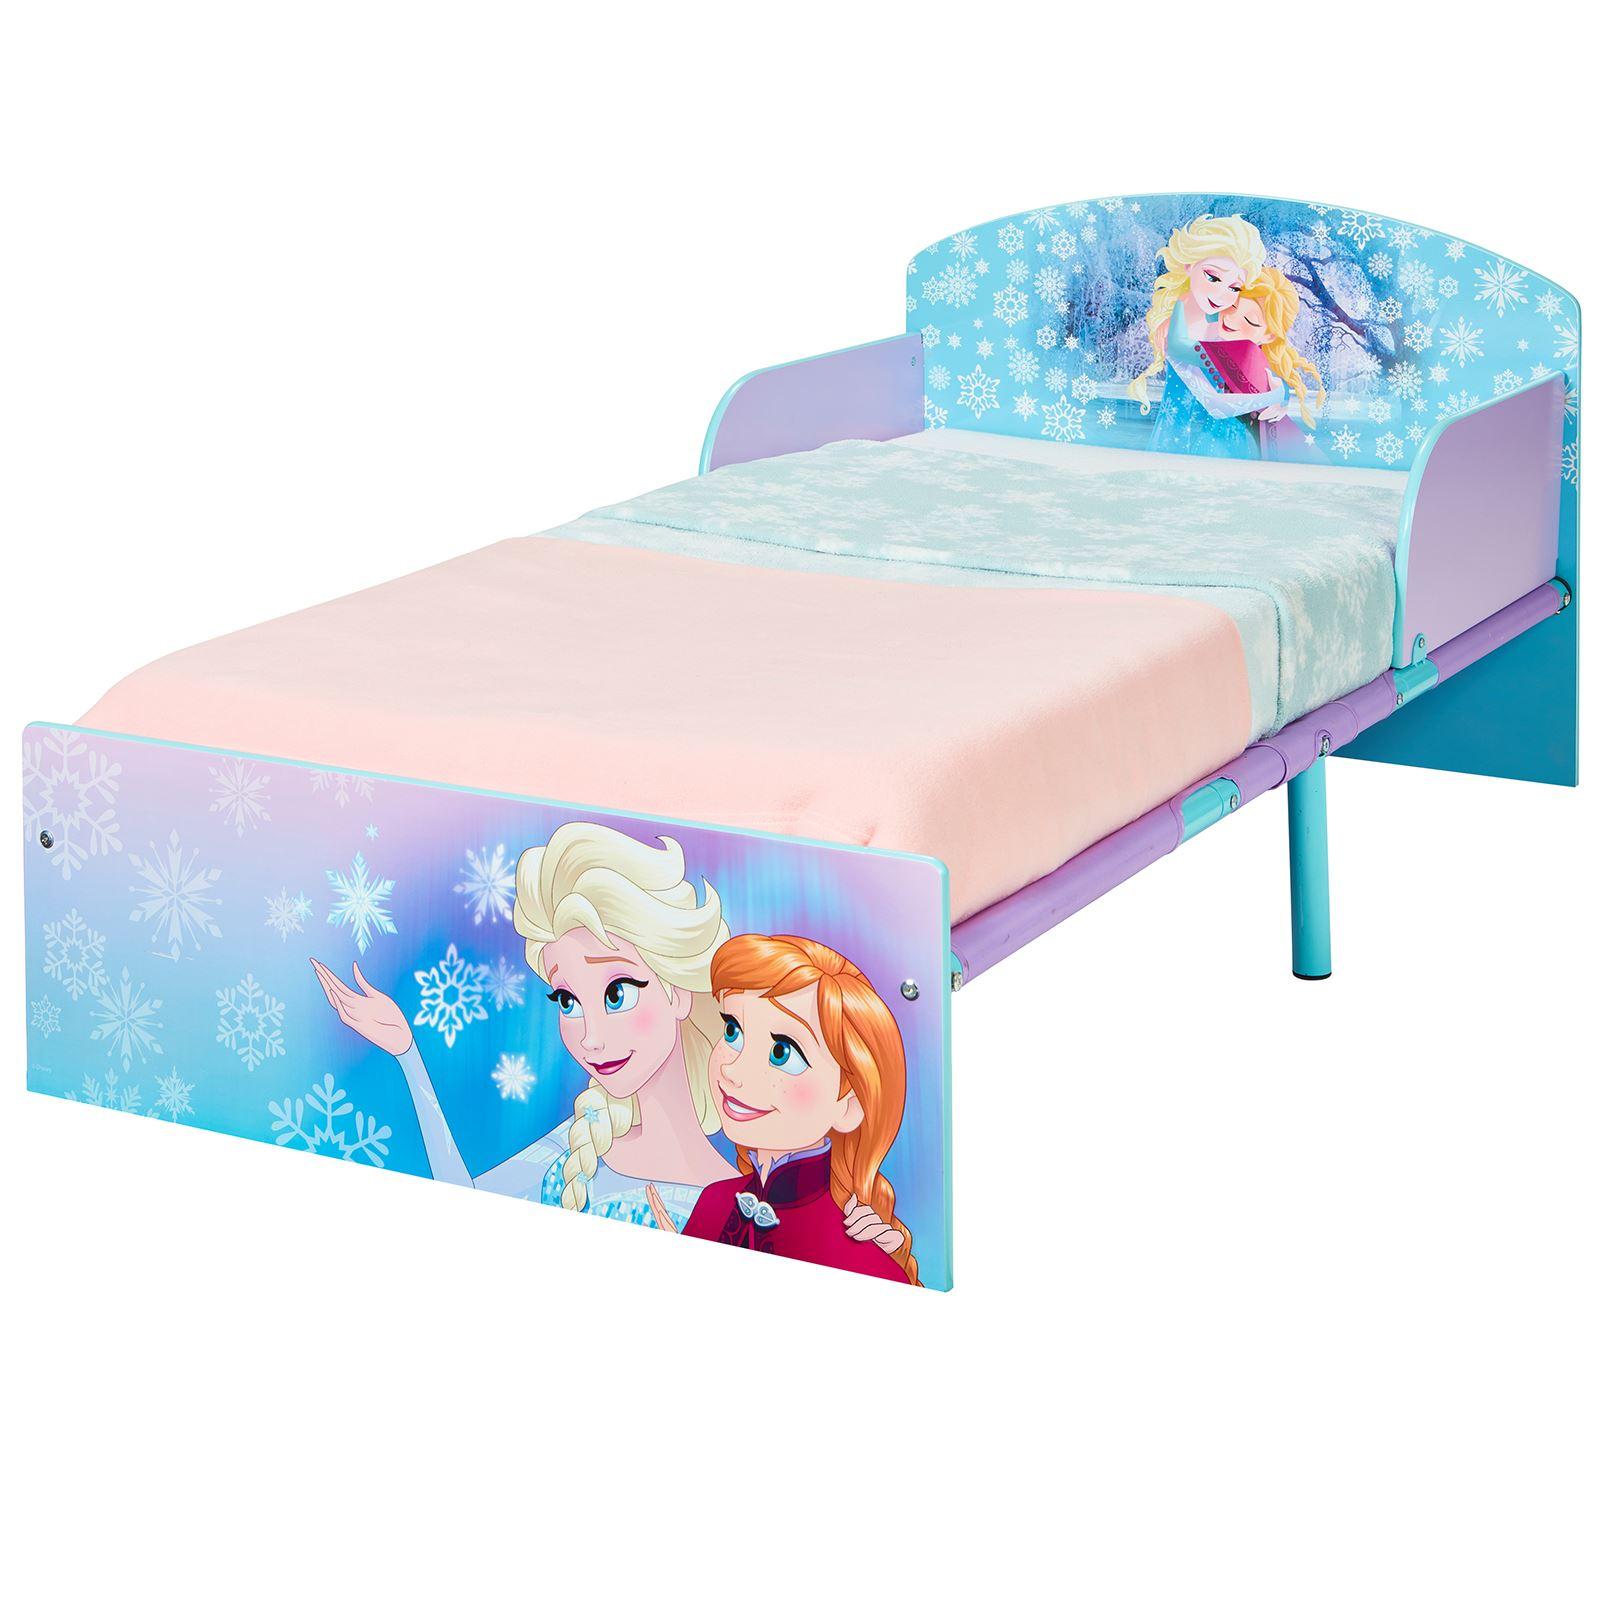 miniatura 11 - KIDS CHARACTER TODDLER BEDS - BOYS GIRLS BEDROOM DISNEY